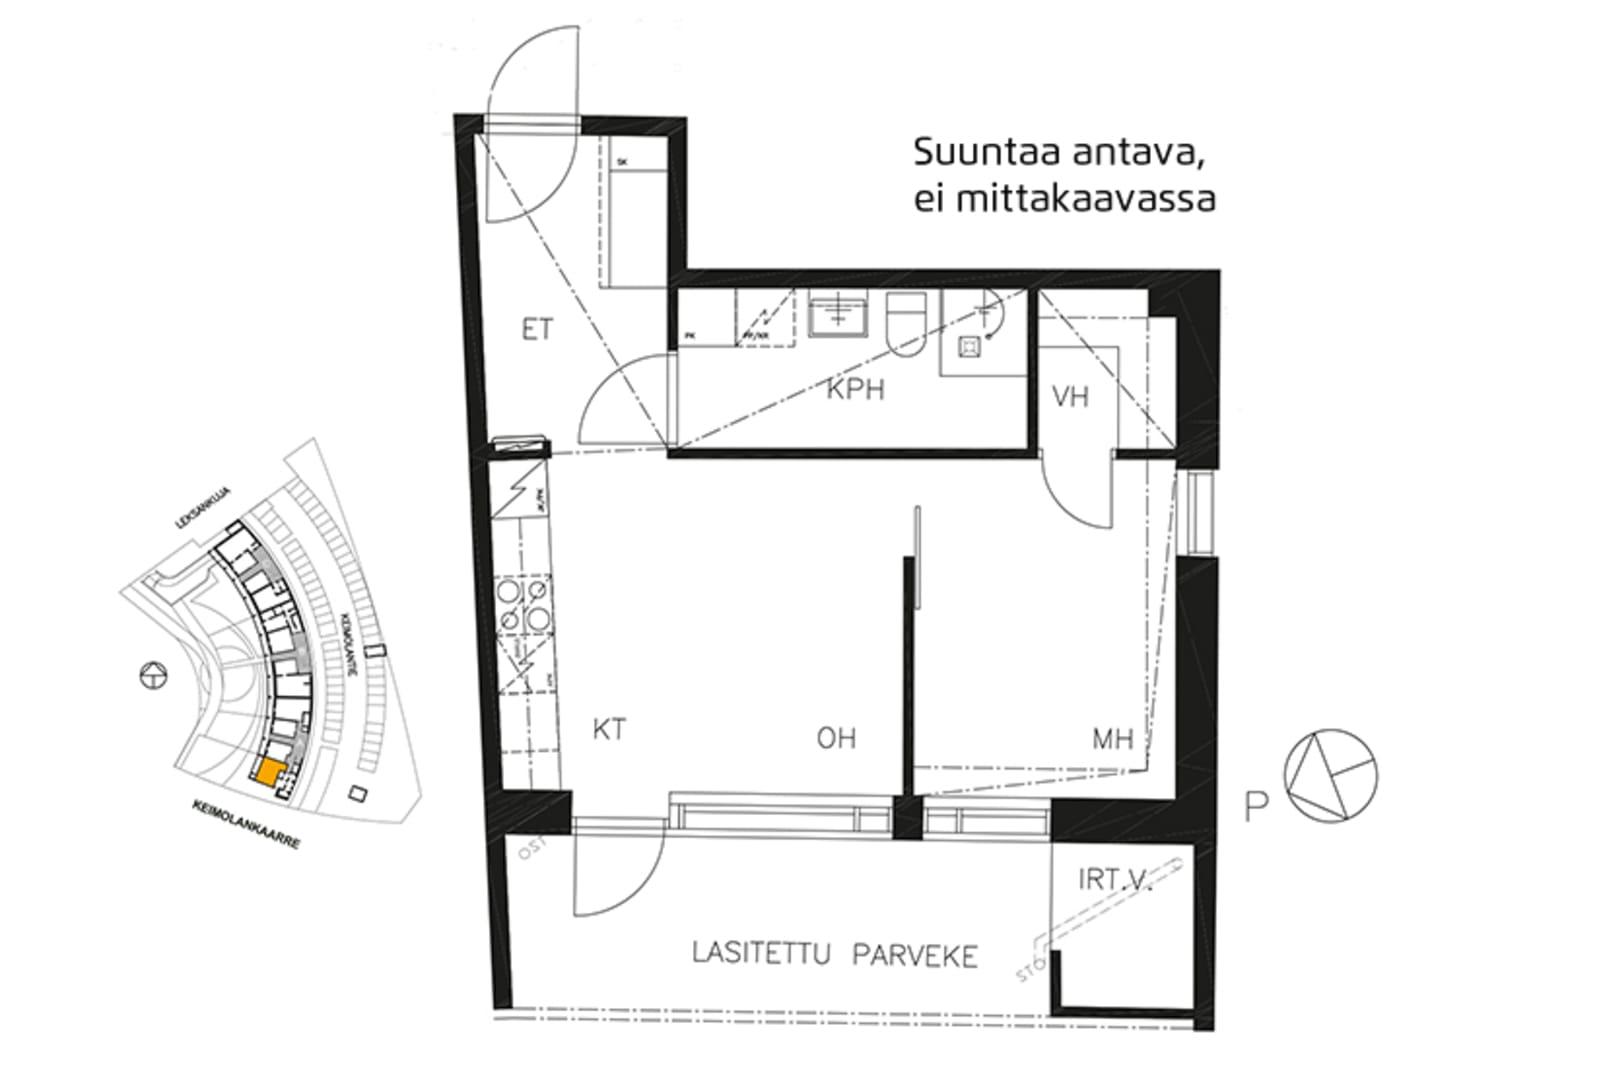 Vantaa, Keimolanmäki, Leksankuja 3 A 001